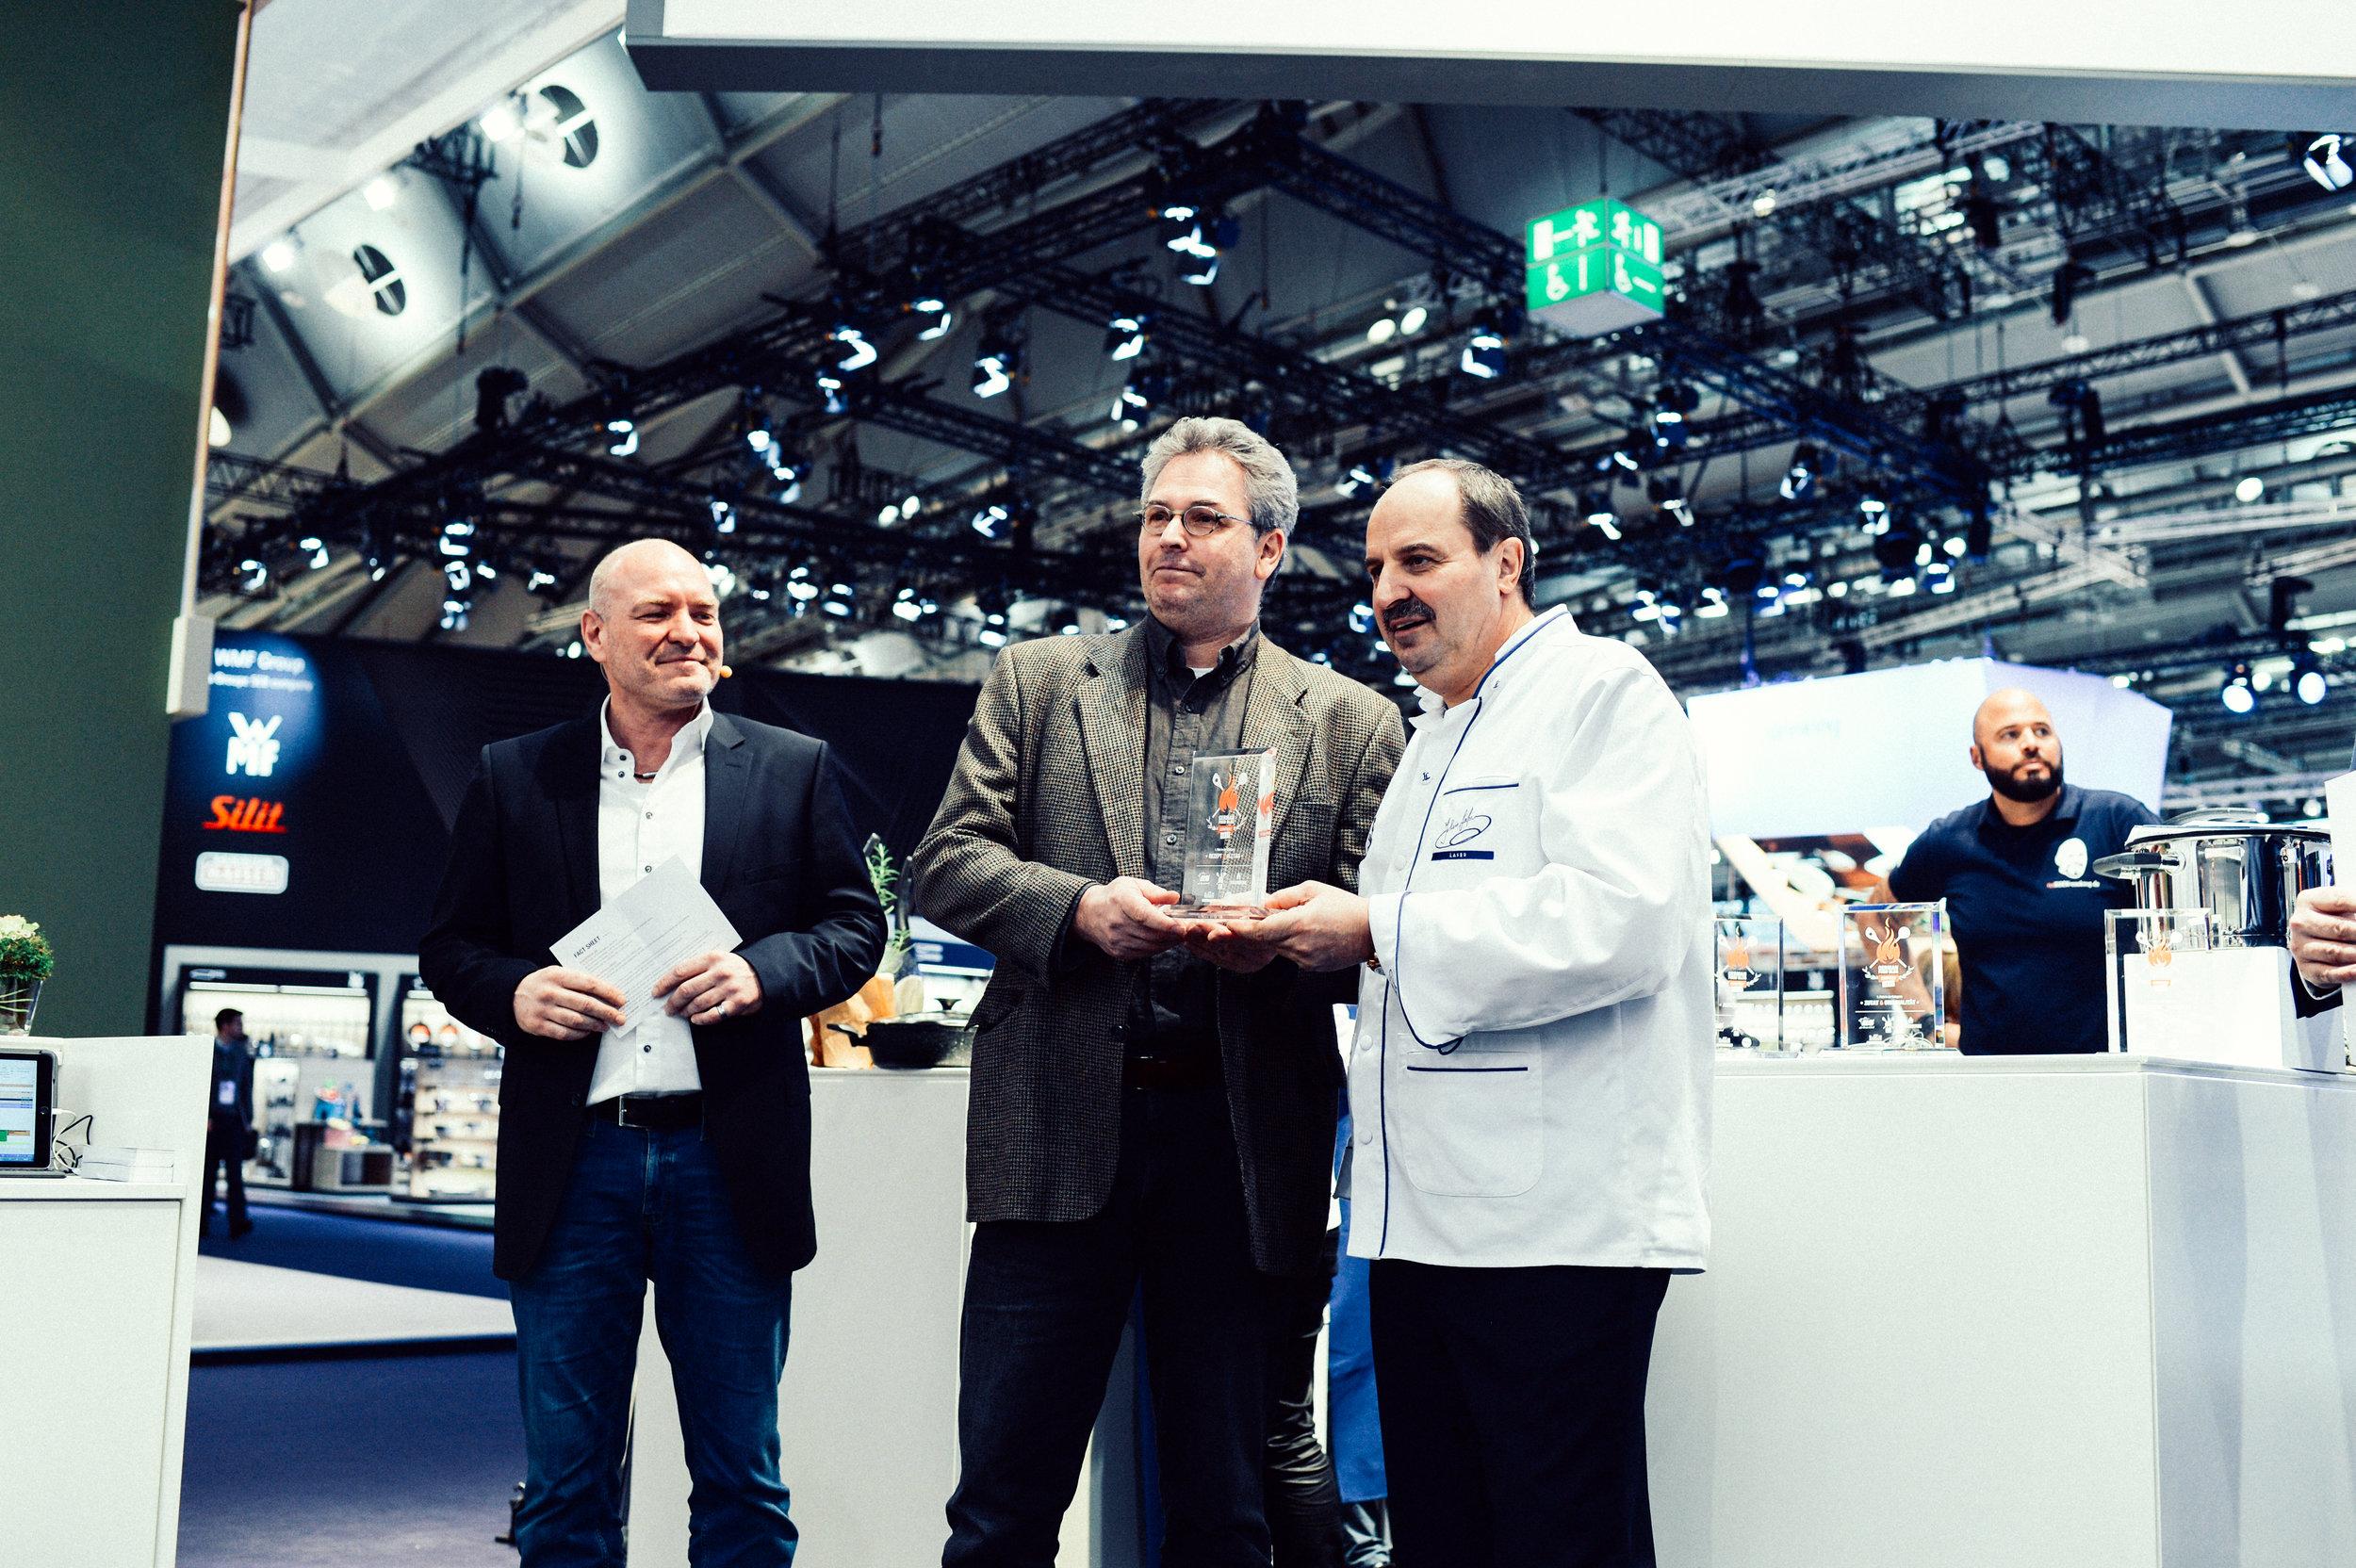 german_food_blog_contest-14.jpg